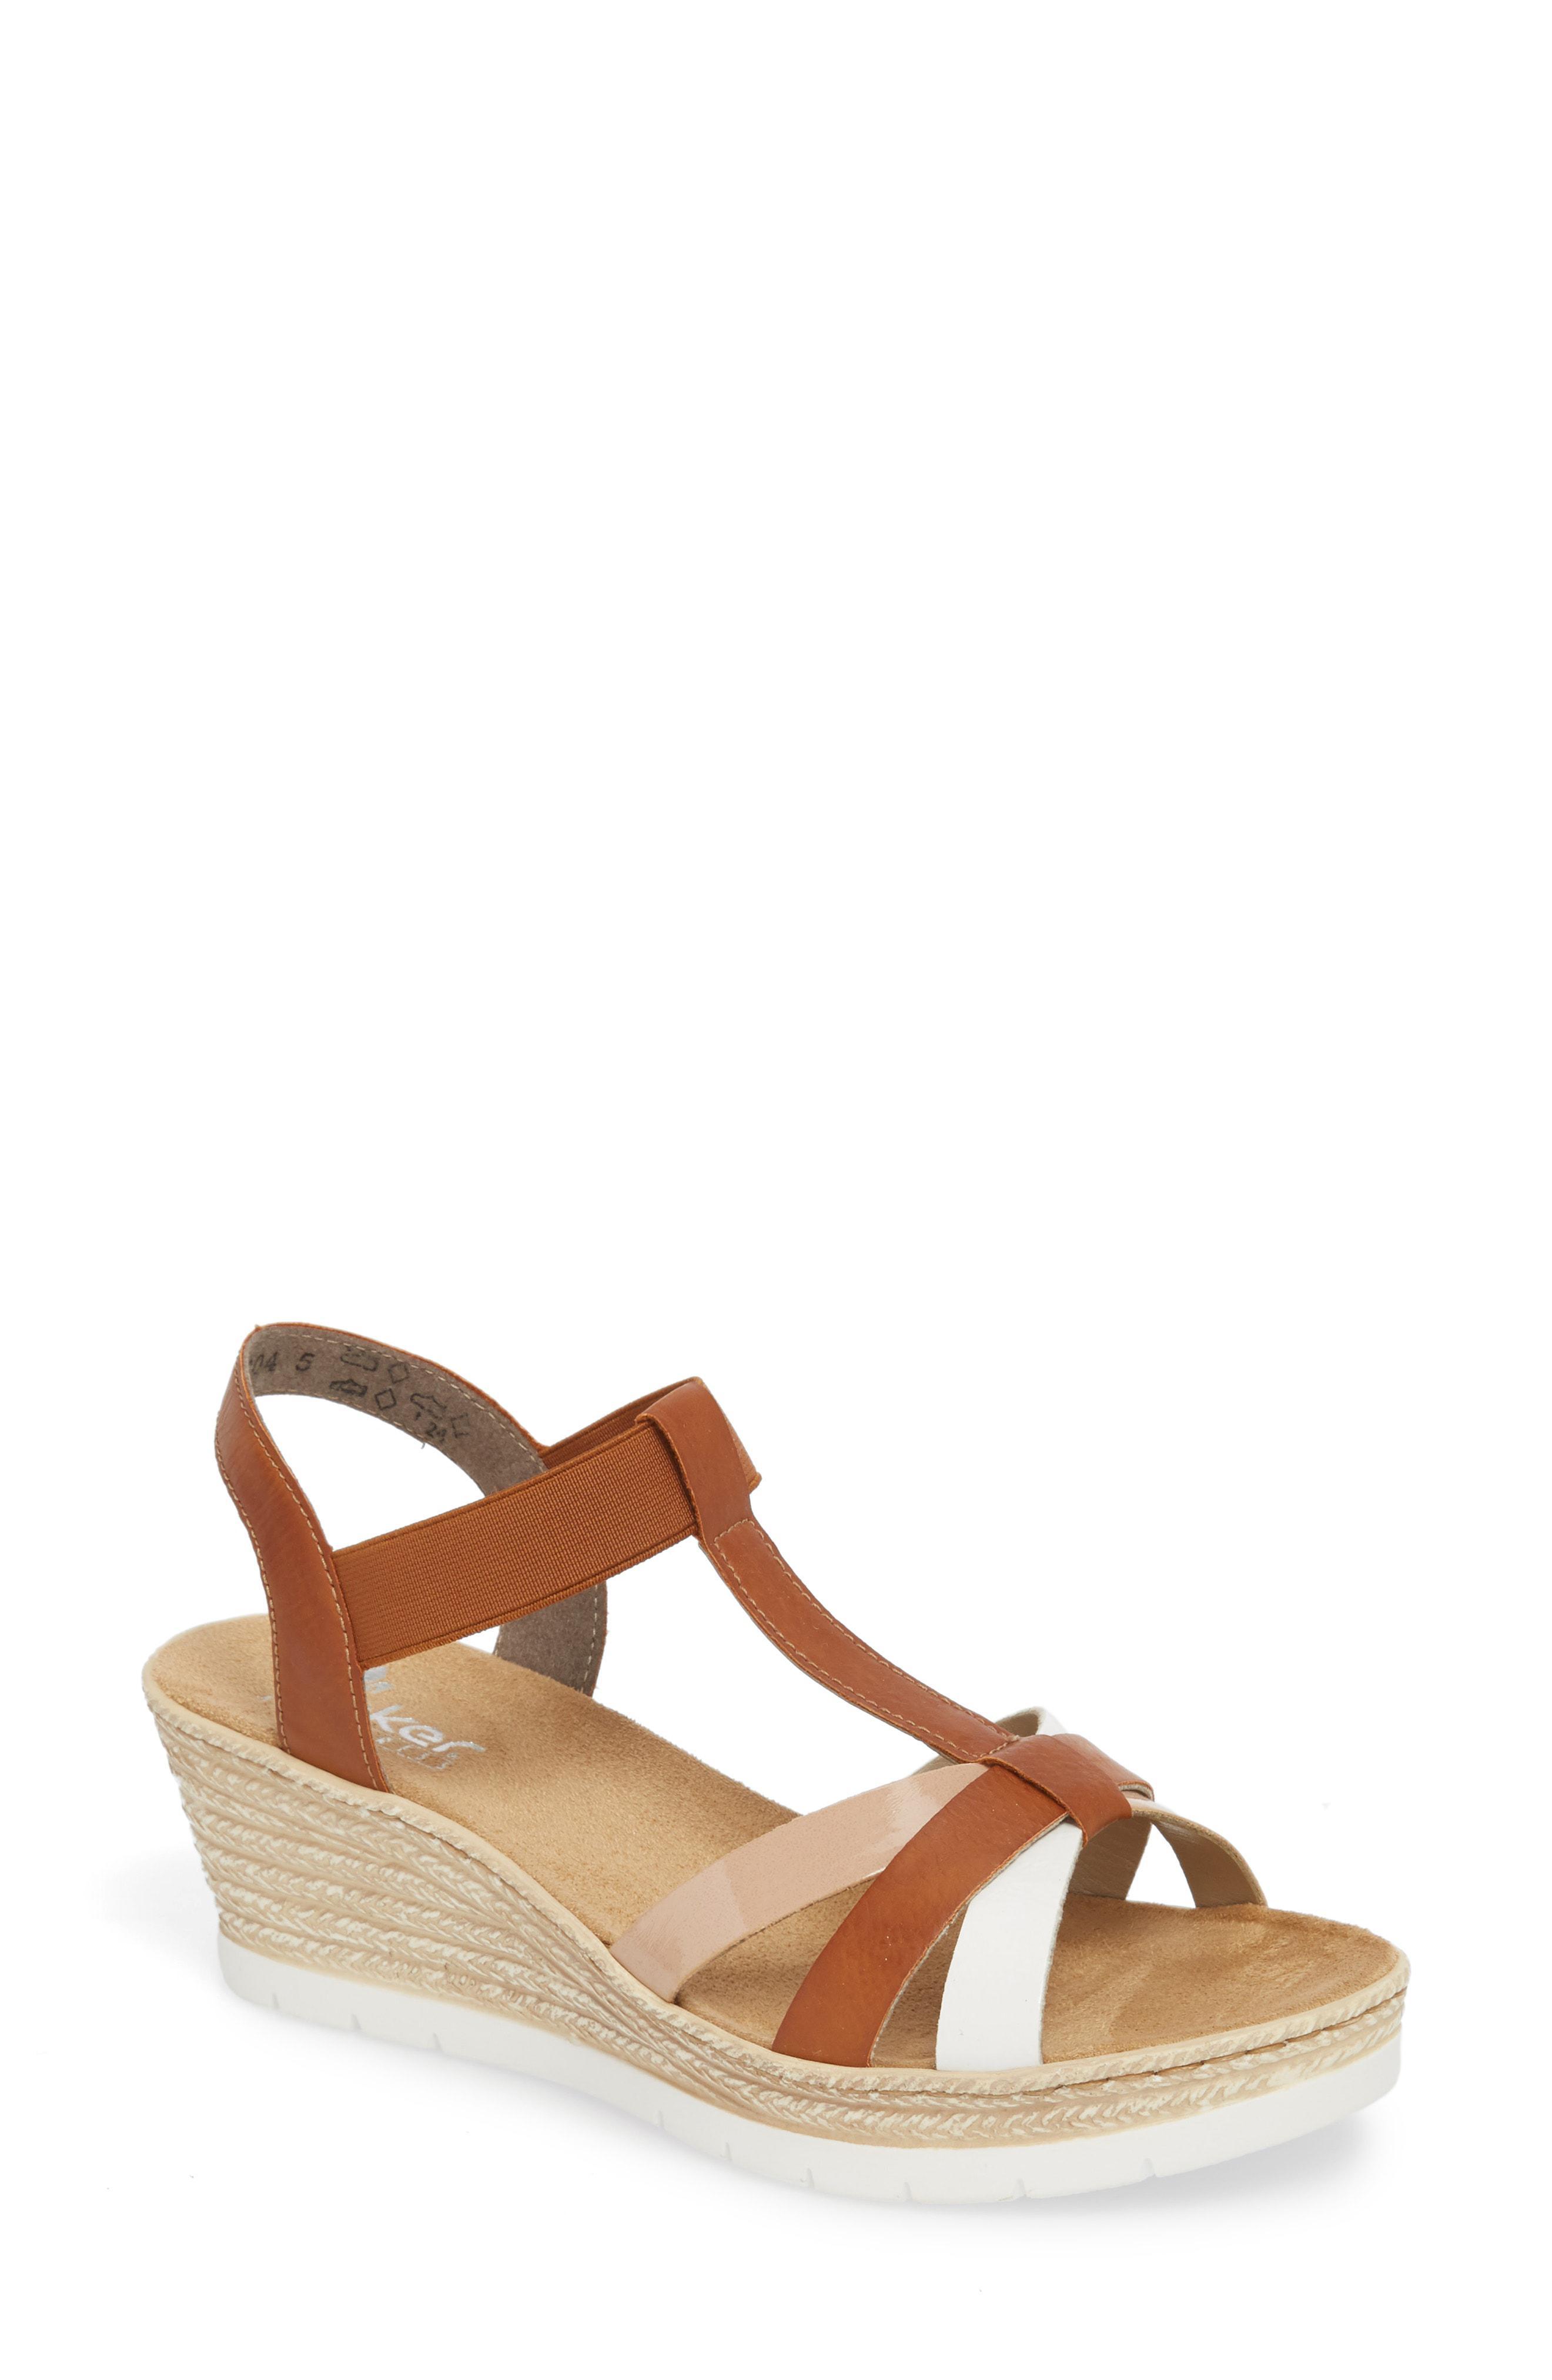 baacd1b2284 Rieker Antistress Fanni 95 Espadrille Wedge Sandal in Brown - Lyst